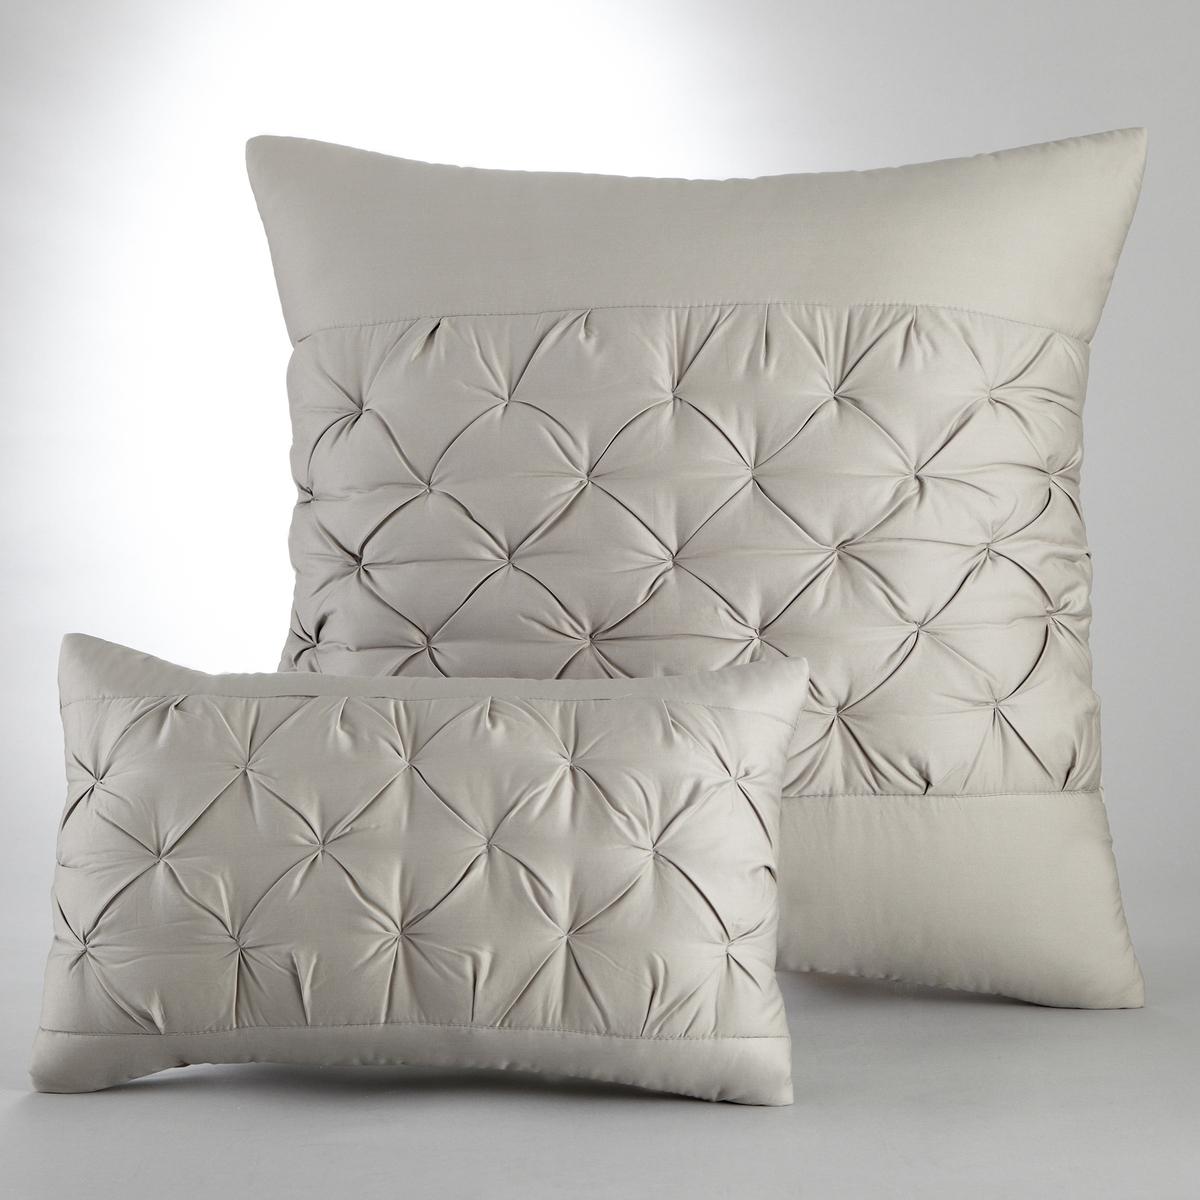 лучшая цена Наволочка La Redoute На подушку-валик или наволочка KHIN 50 x 30 см серый